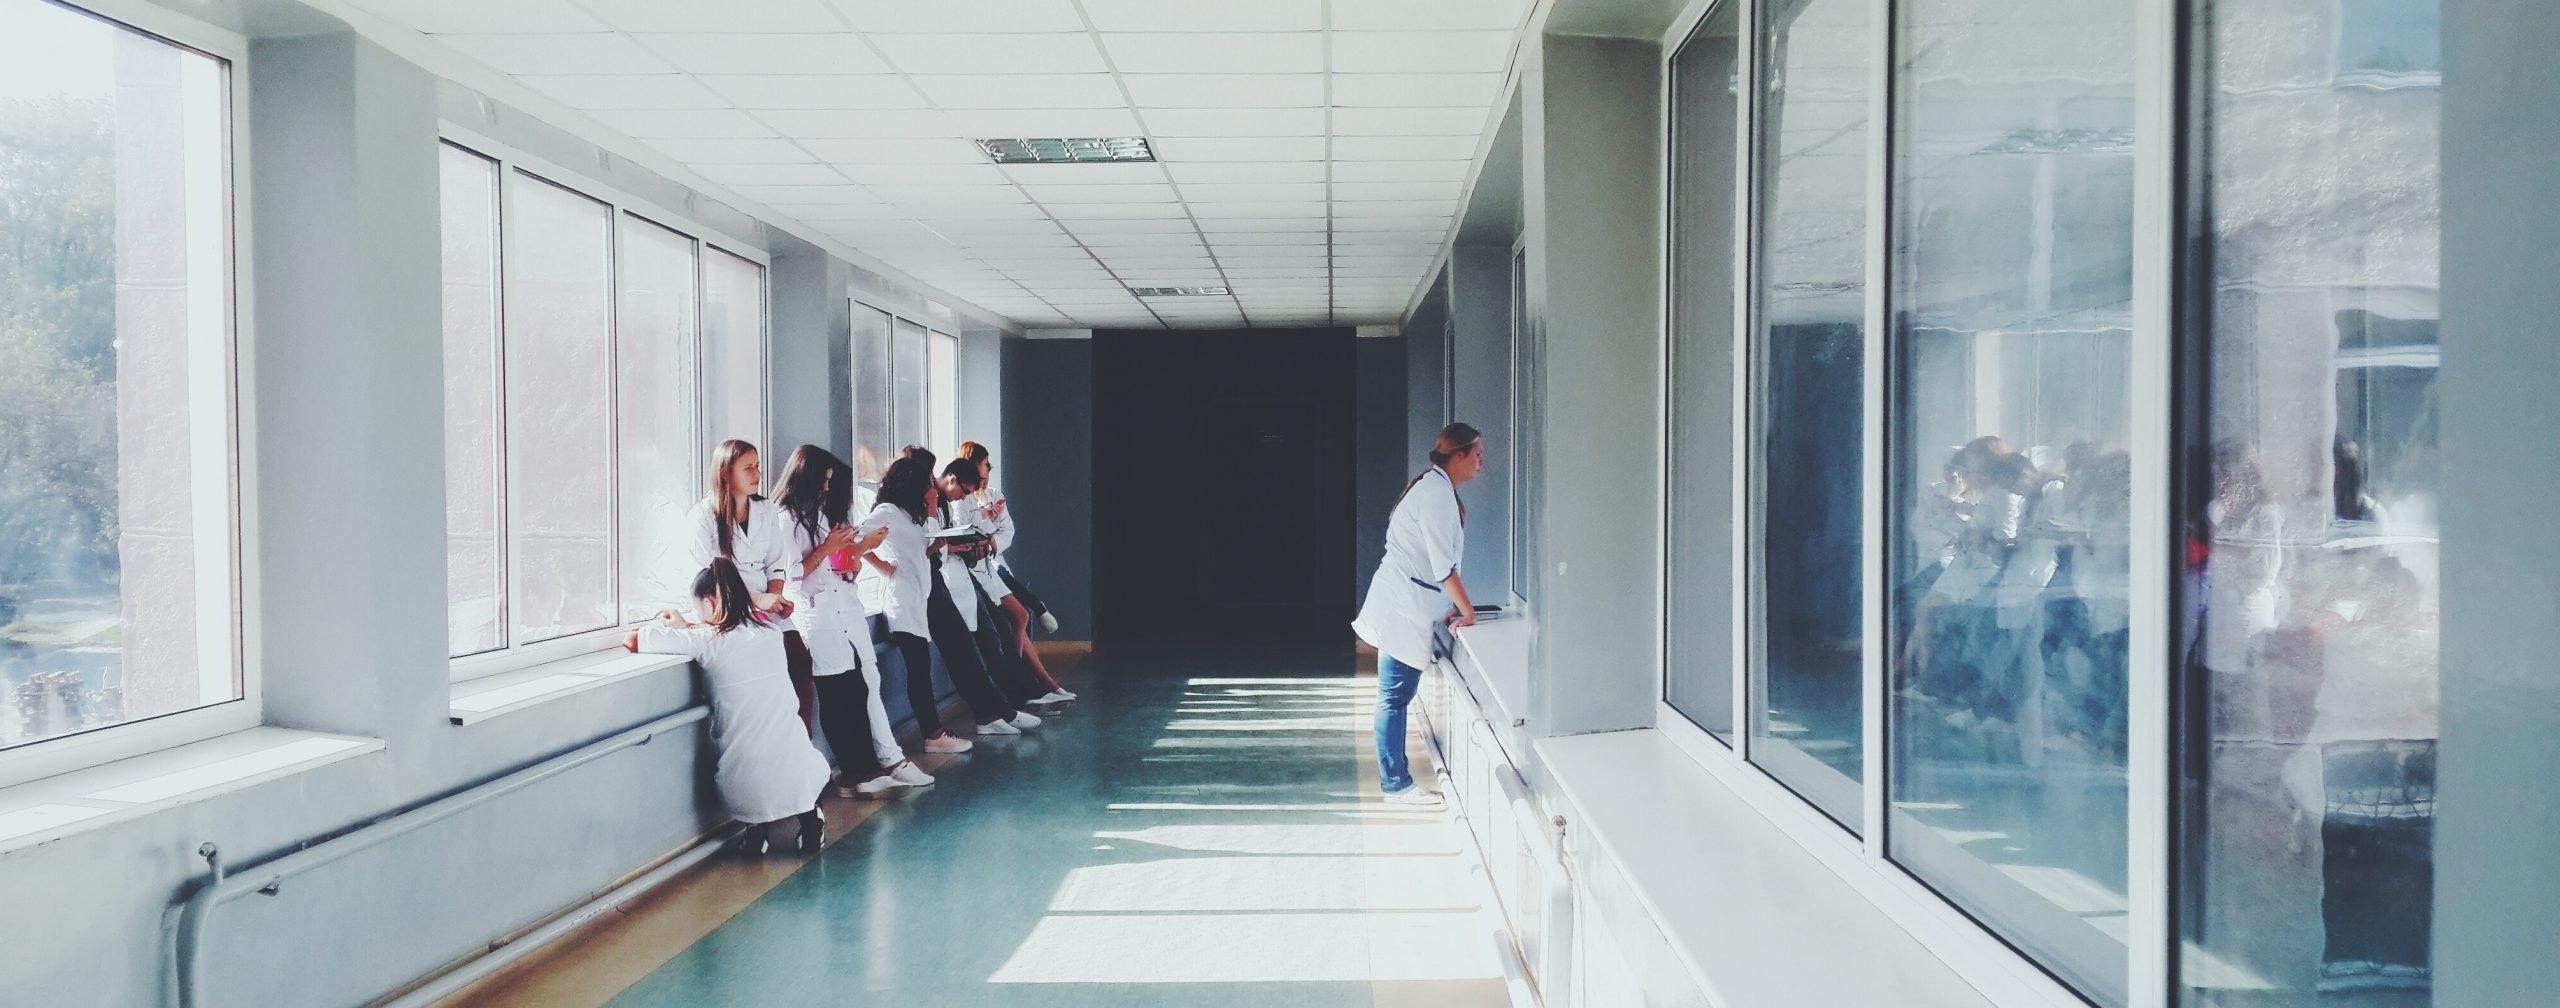 Crimes Barring Medical Practicing